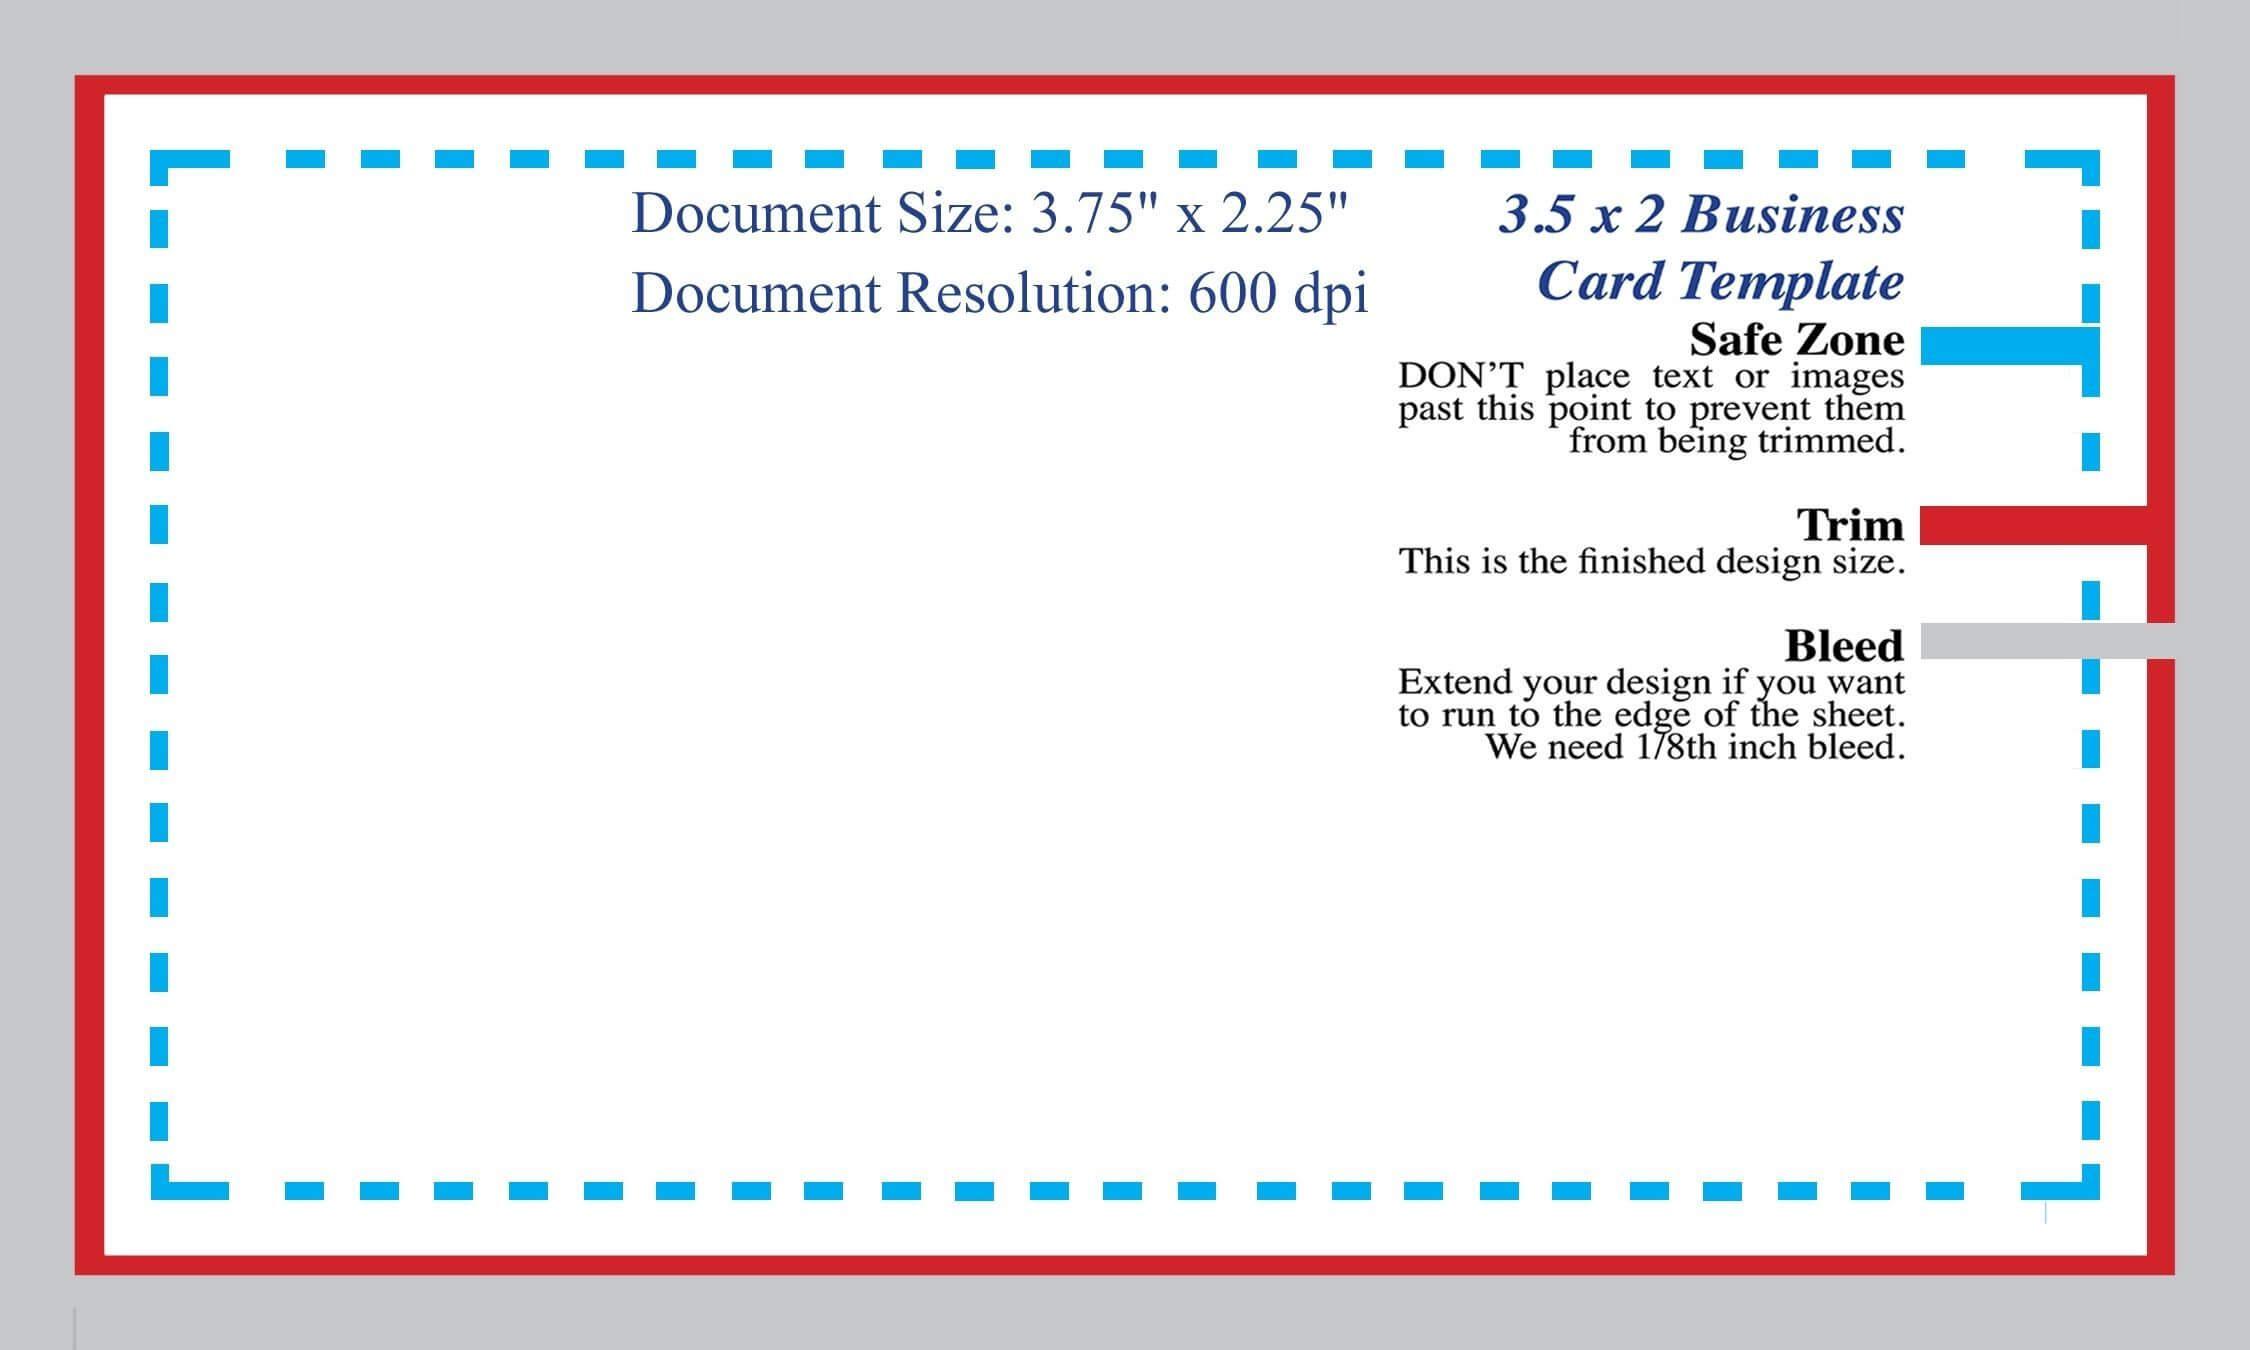 Standard Business Card Blank Template Photoshop Template Intended For Business Card Size Photoshop Template